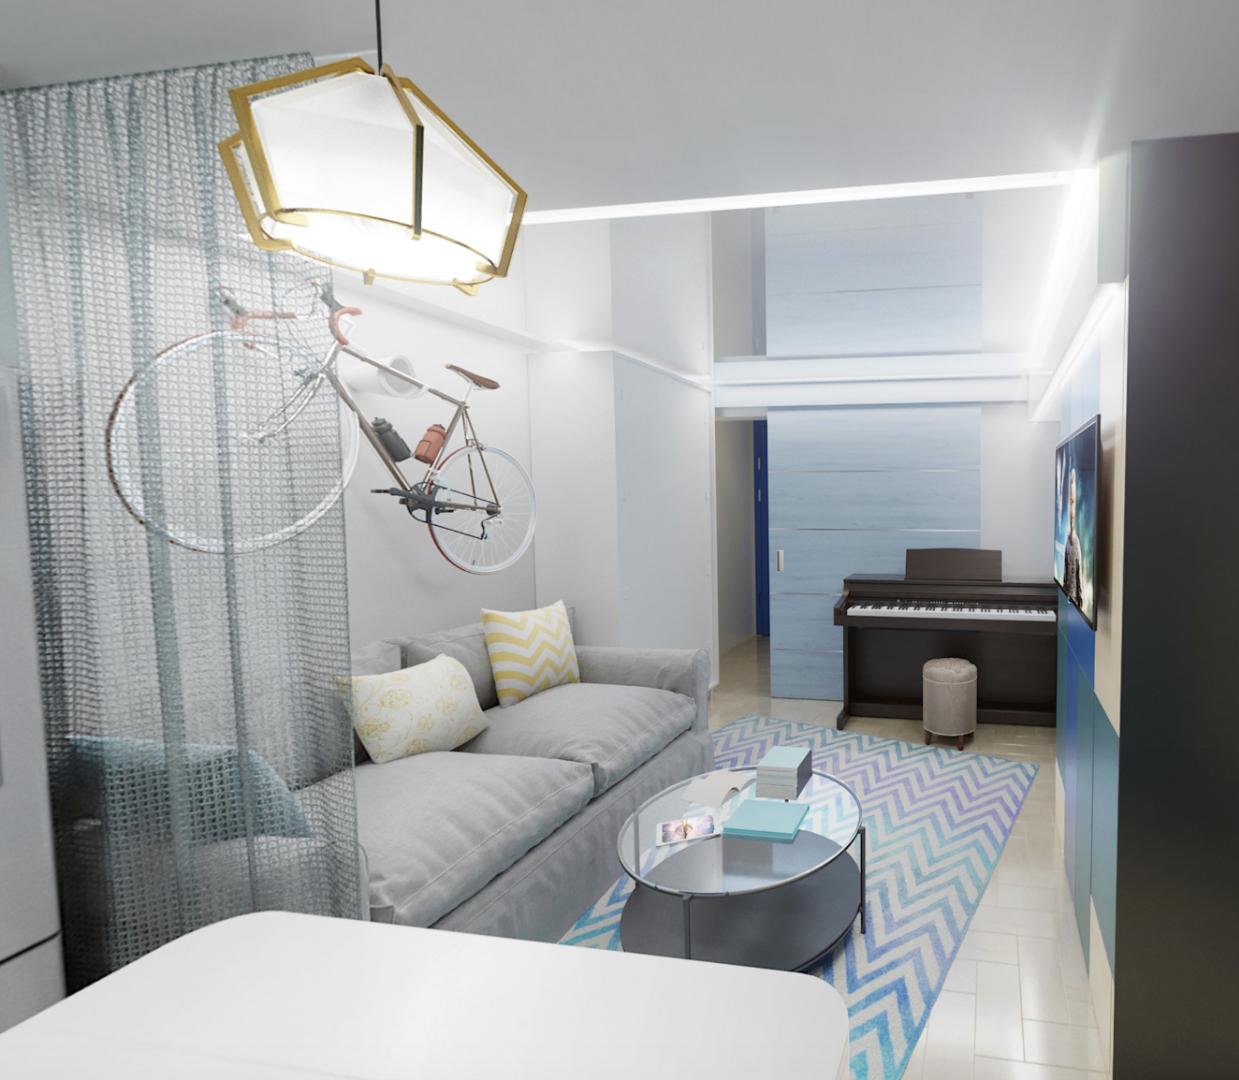 Small Modern Living Room Apartment Residential Interior Design Hong Kong Inter Small Living Room Design Modern Apartment Living Room Small Modern Living Room #small #modern #living #room #design